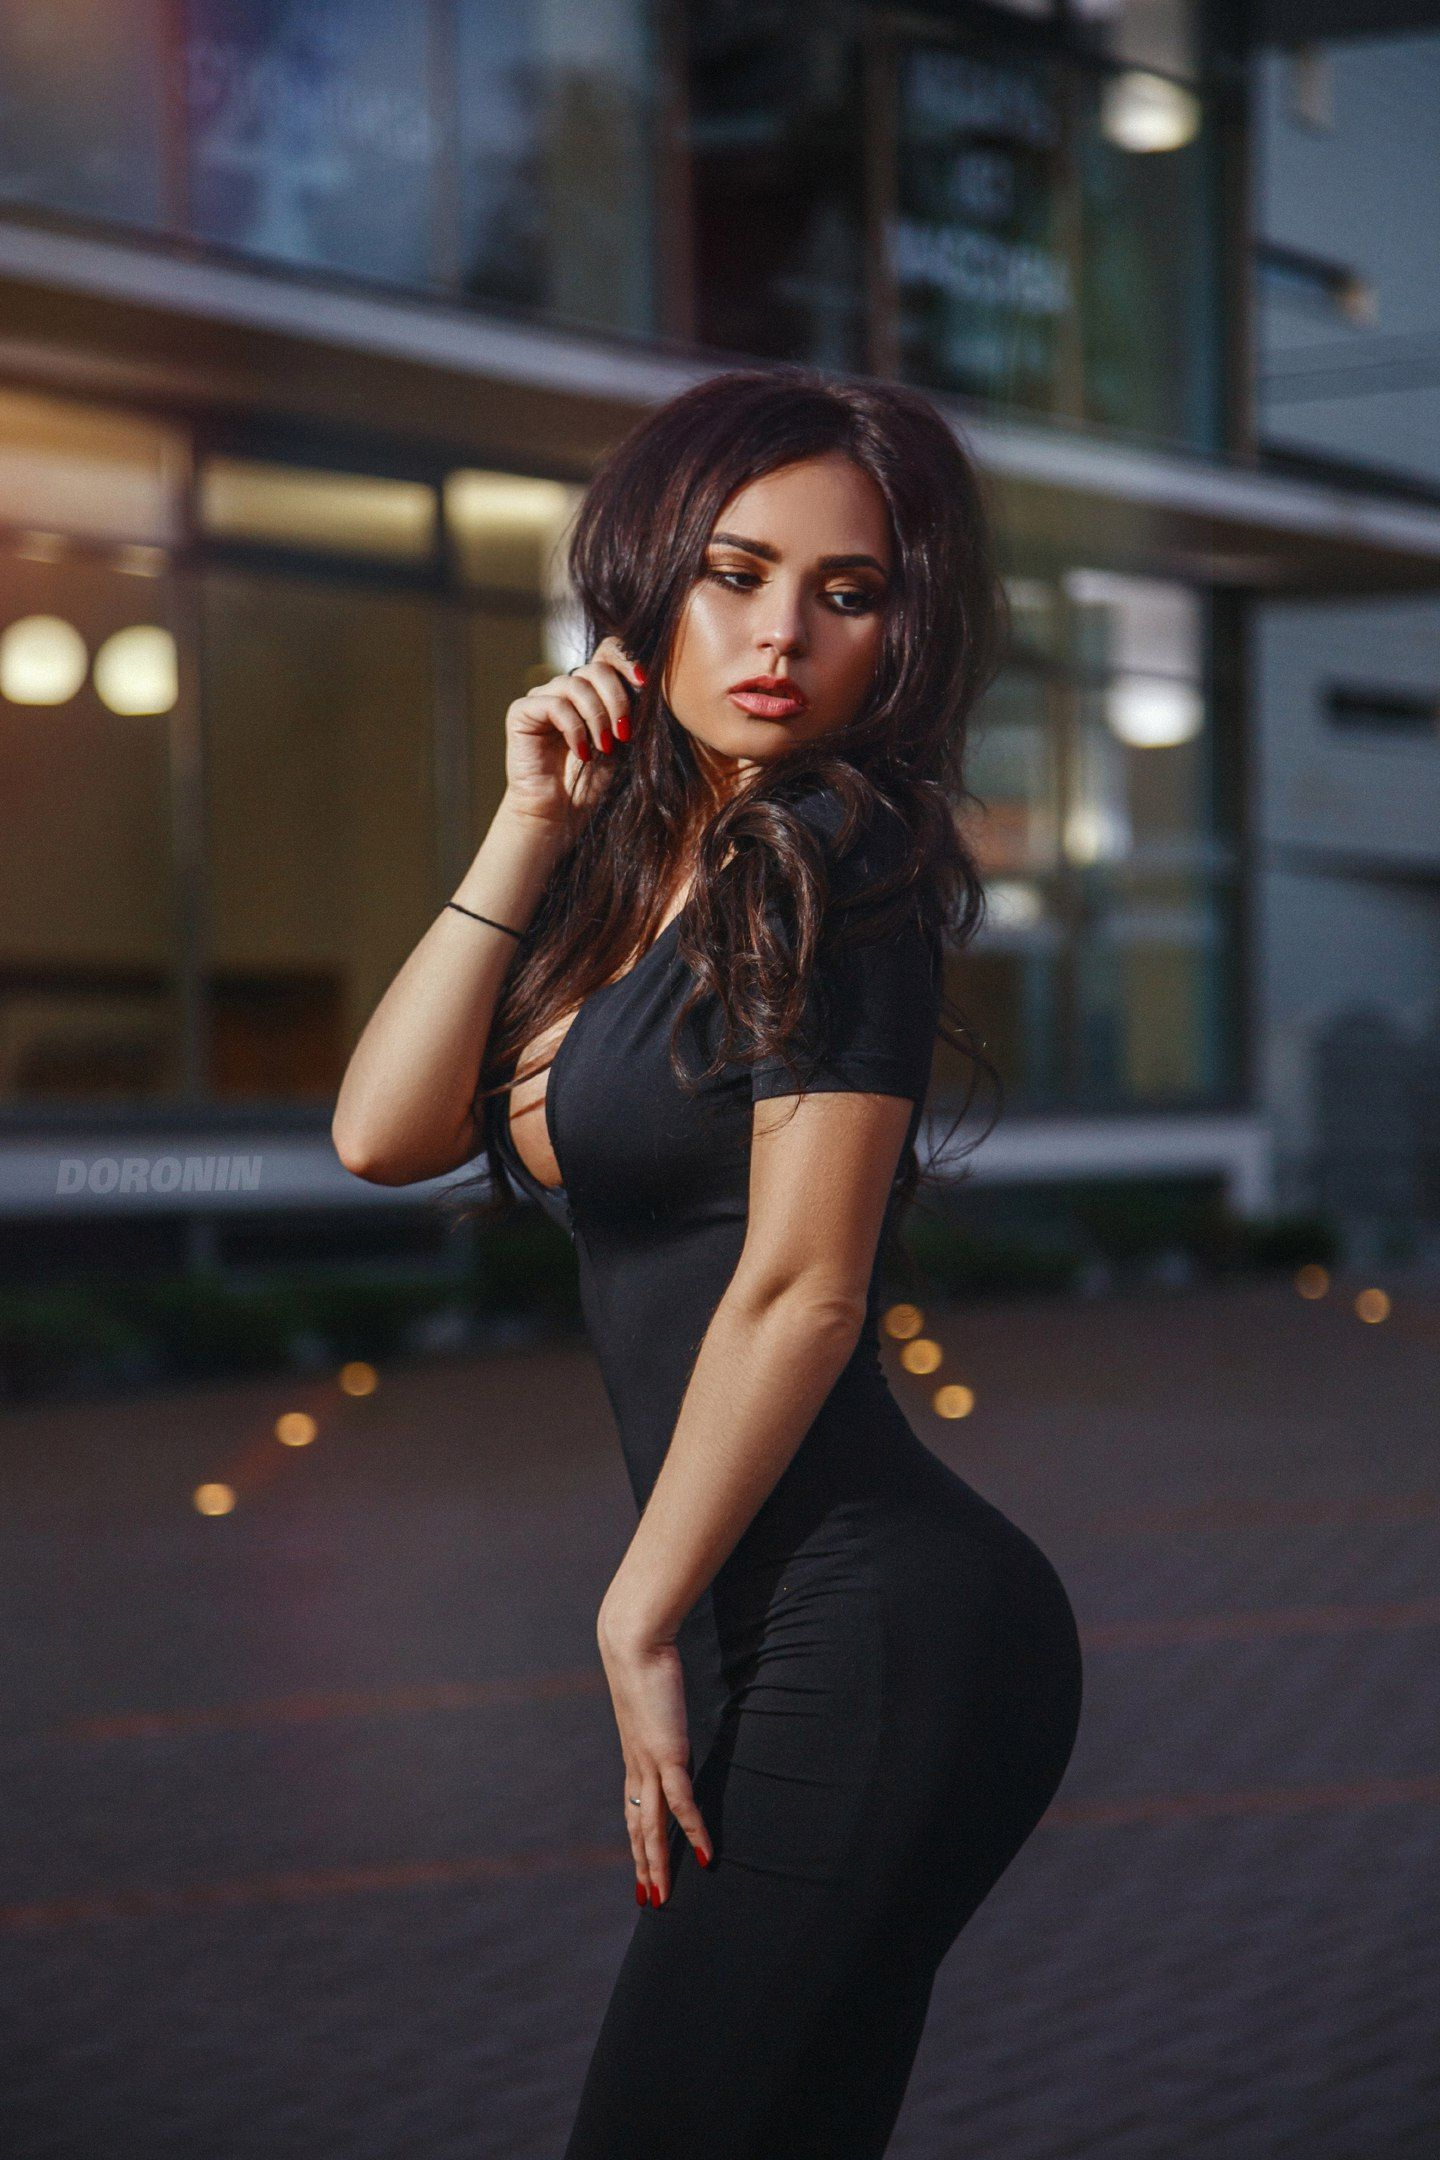 ICloud Lesya Makeeva nudes (15 photo), Instagram